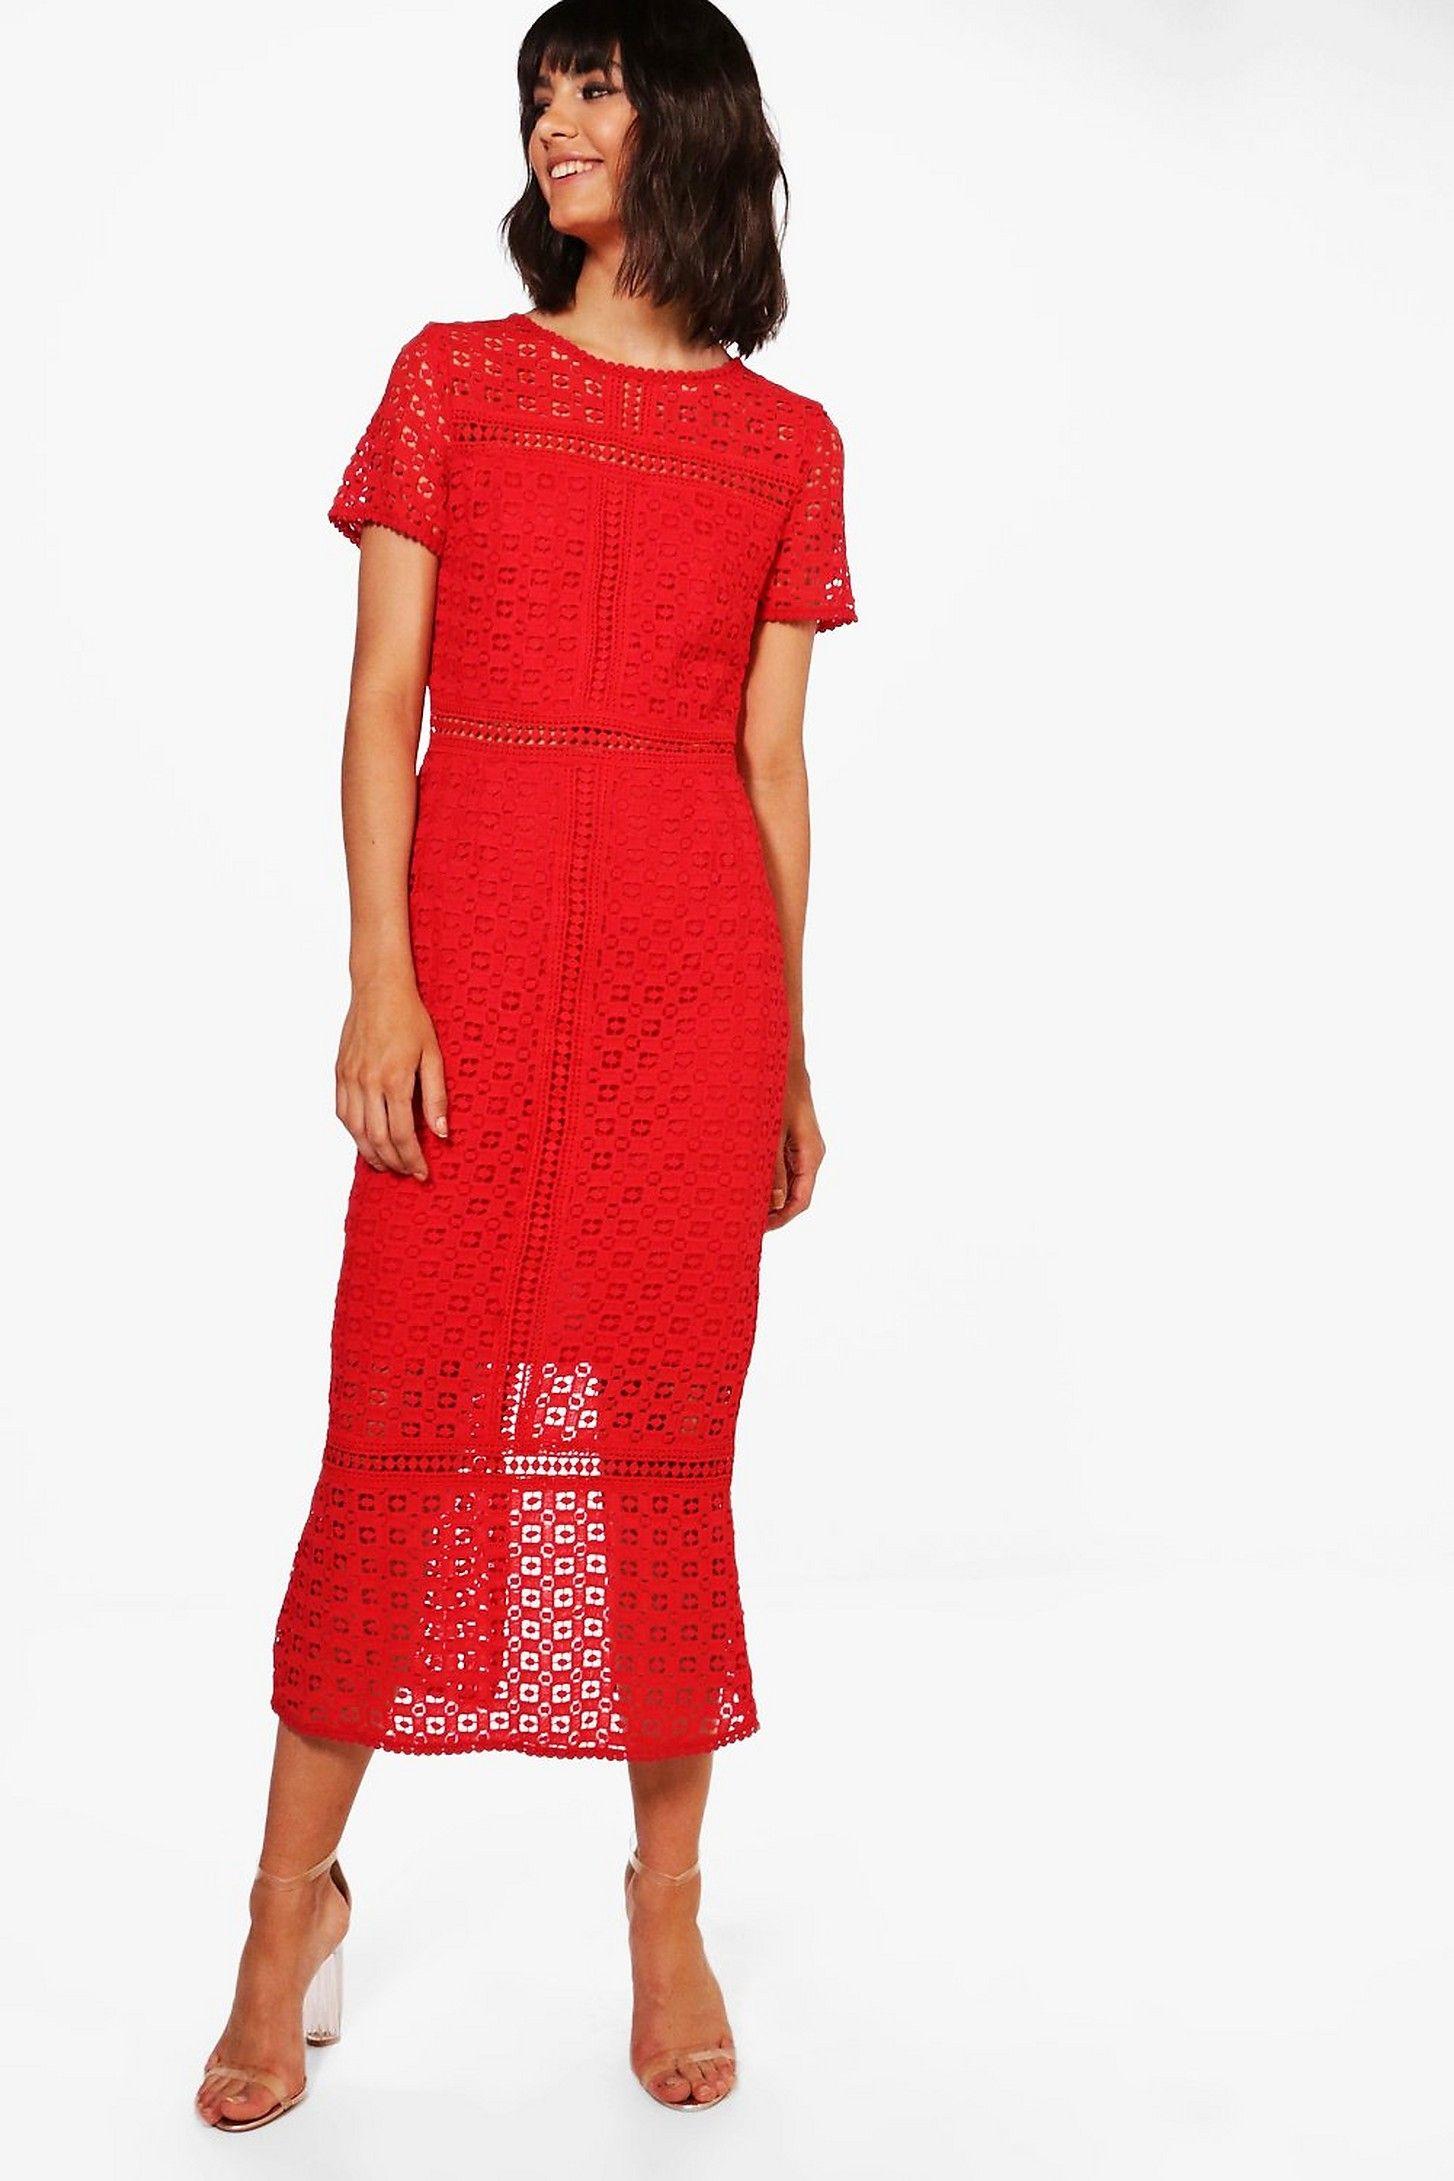 Boutique Crochet Midi Dress Boohoo Crochet Midi Dress Red Midi Dress Bodycon Fashion